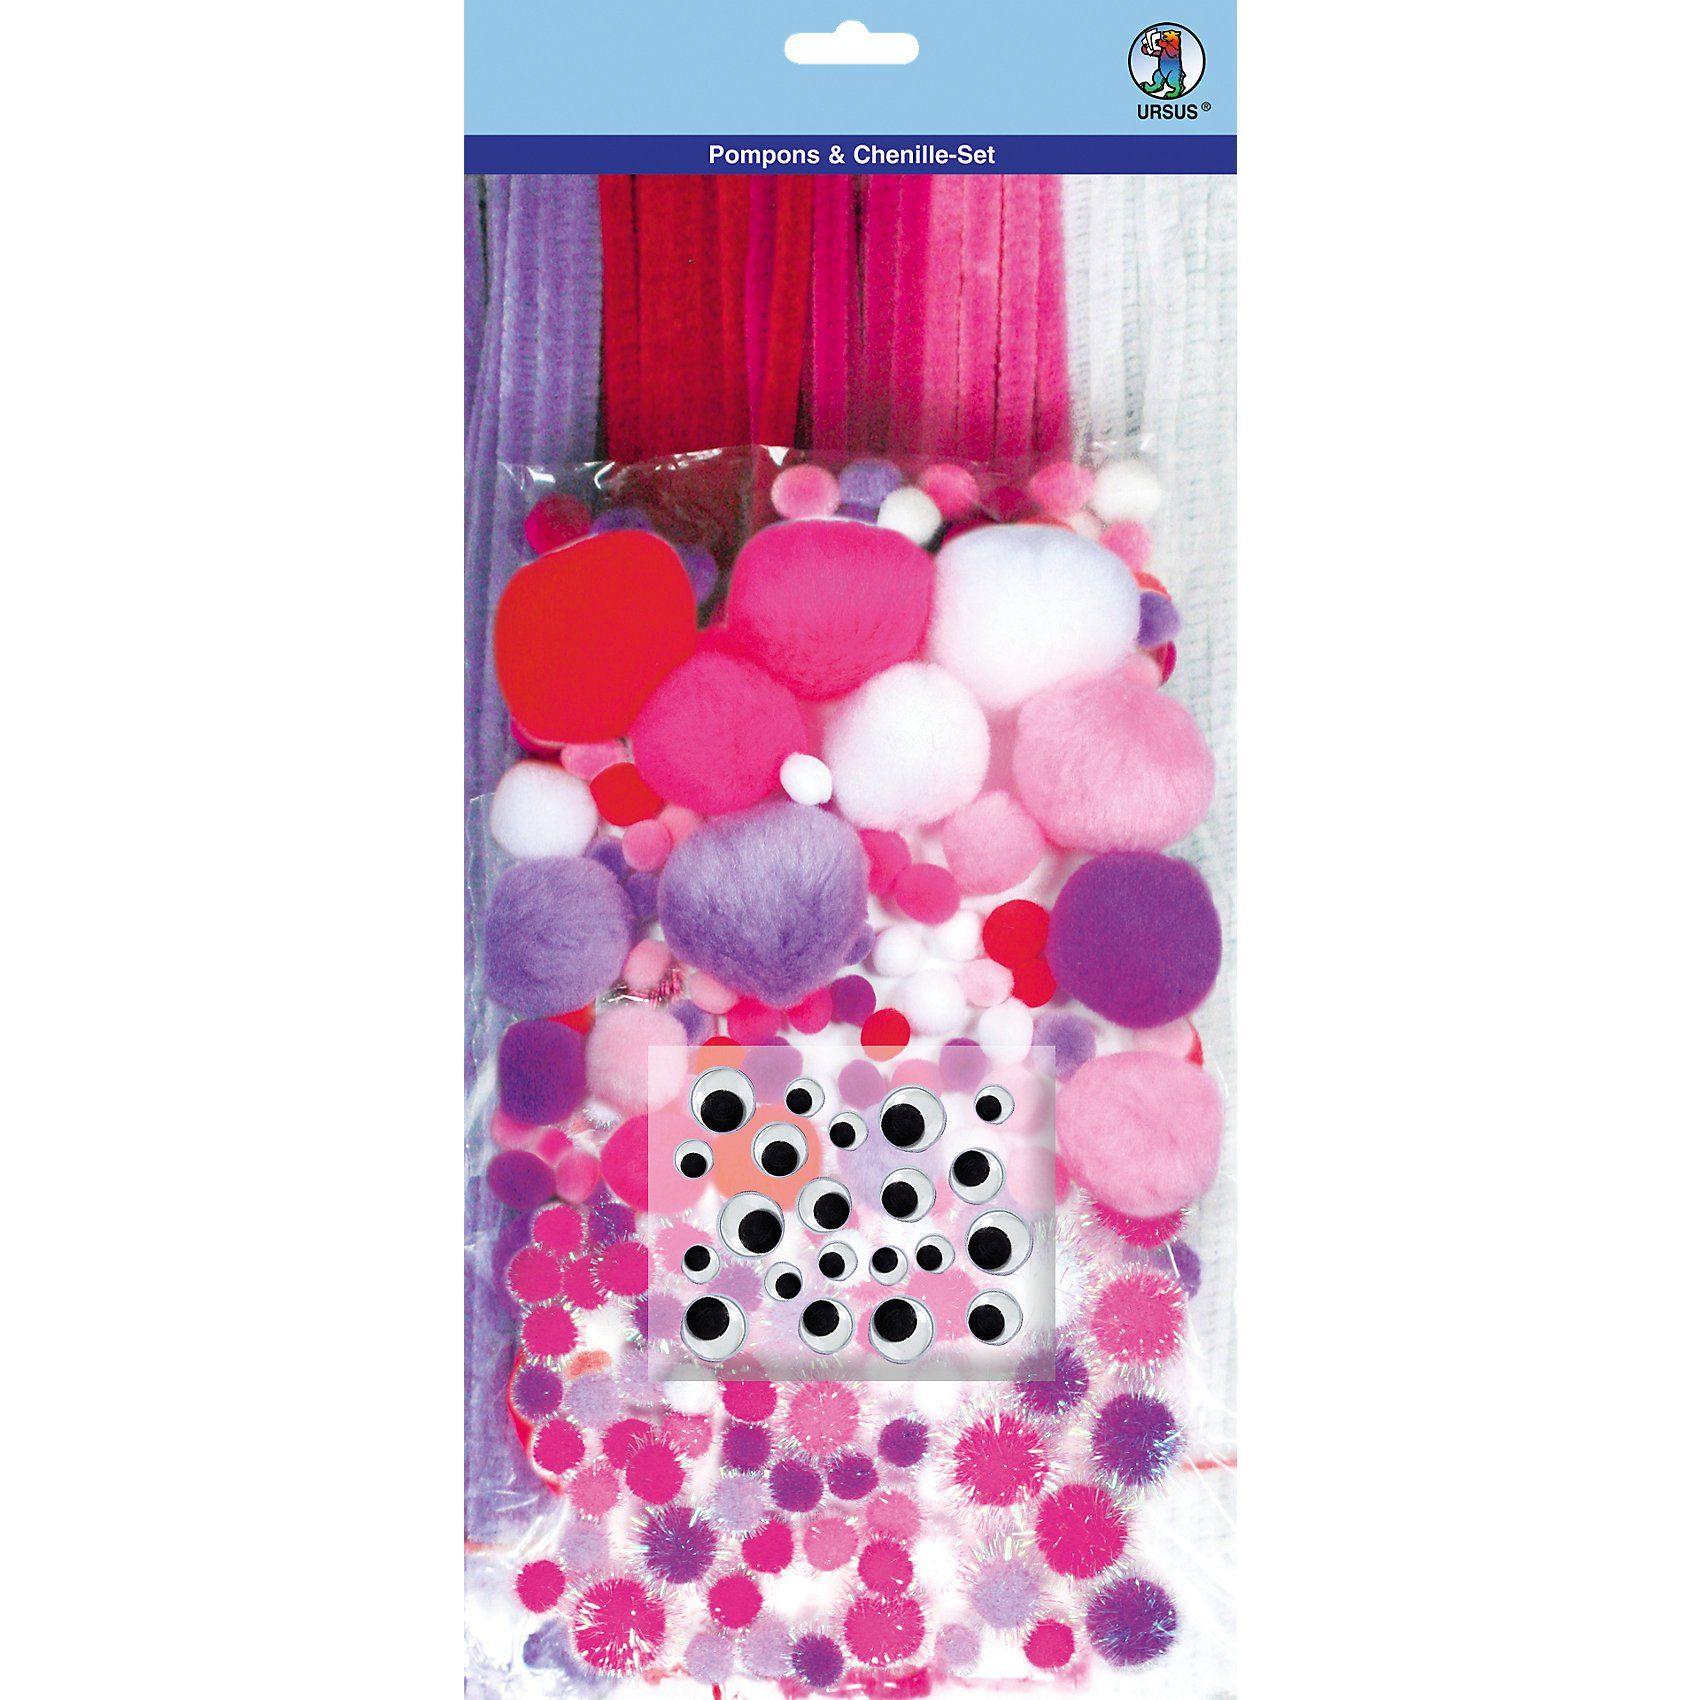 URSUS Pompons & Chenille-Set, lila/pink